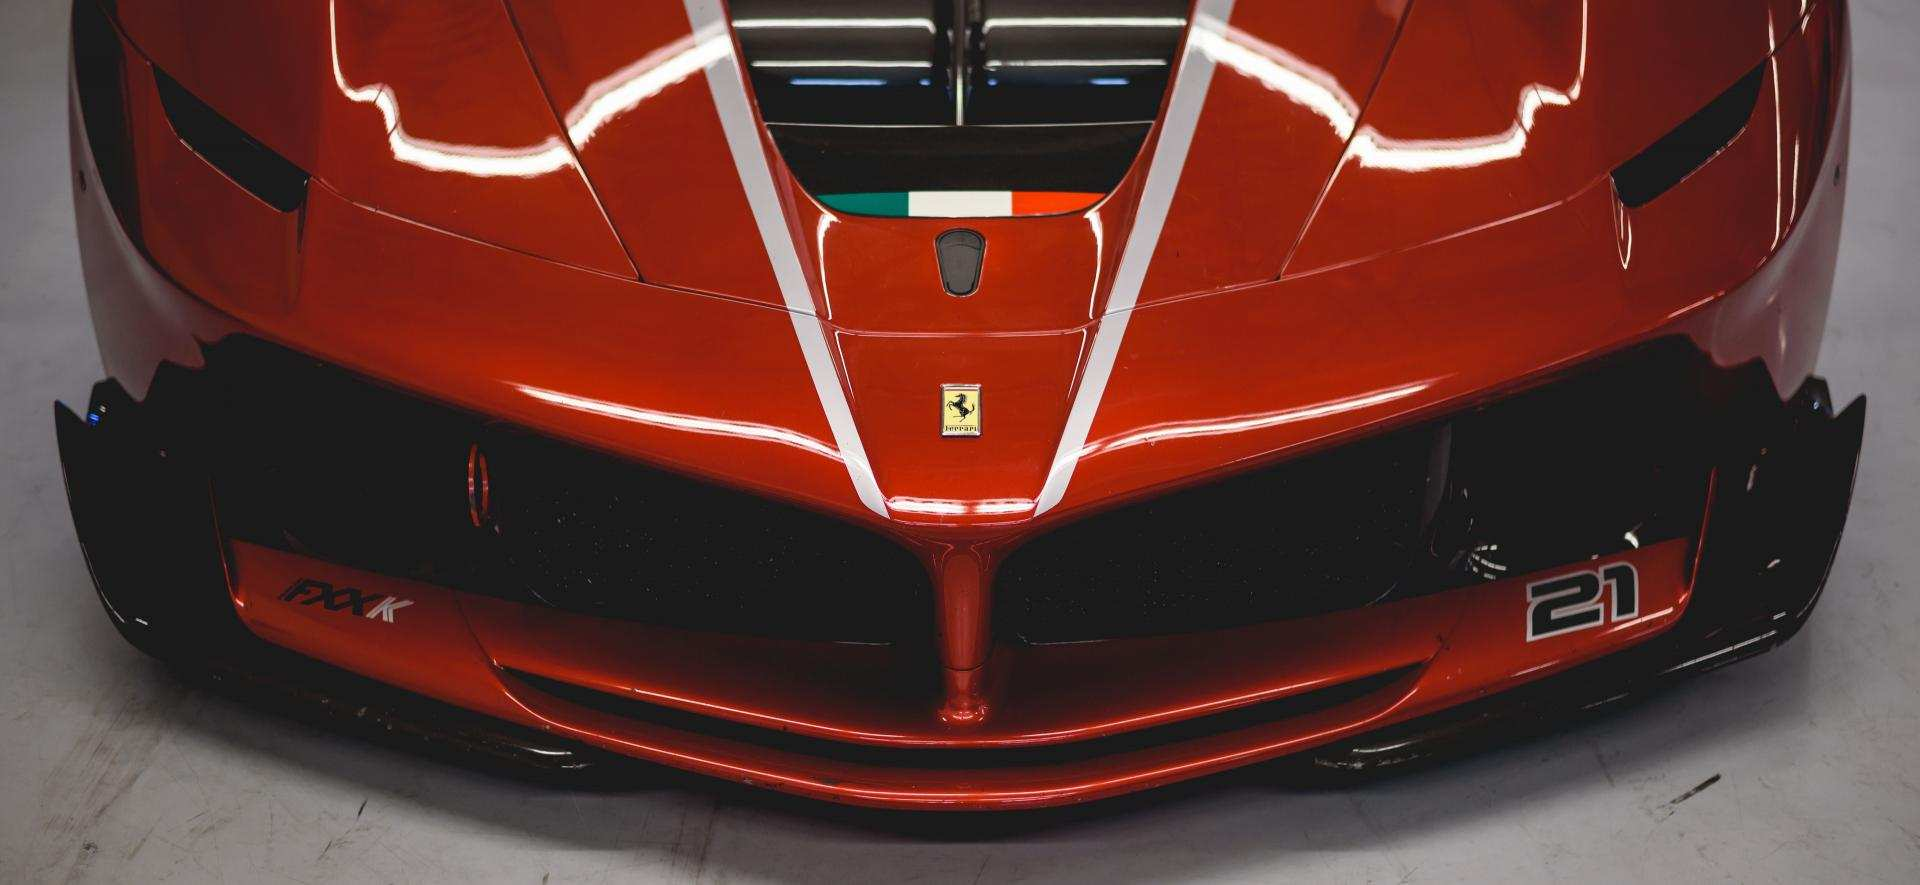 56 New New Ferrari Challenge 2019 Calendar Price Model with New Ferrari Challenge 2019 Calendar Price